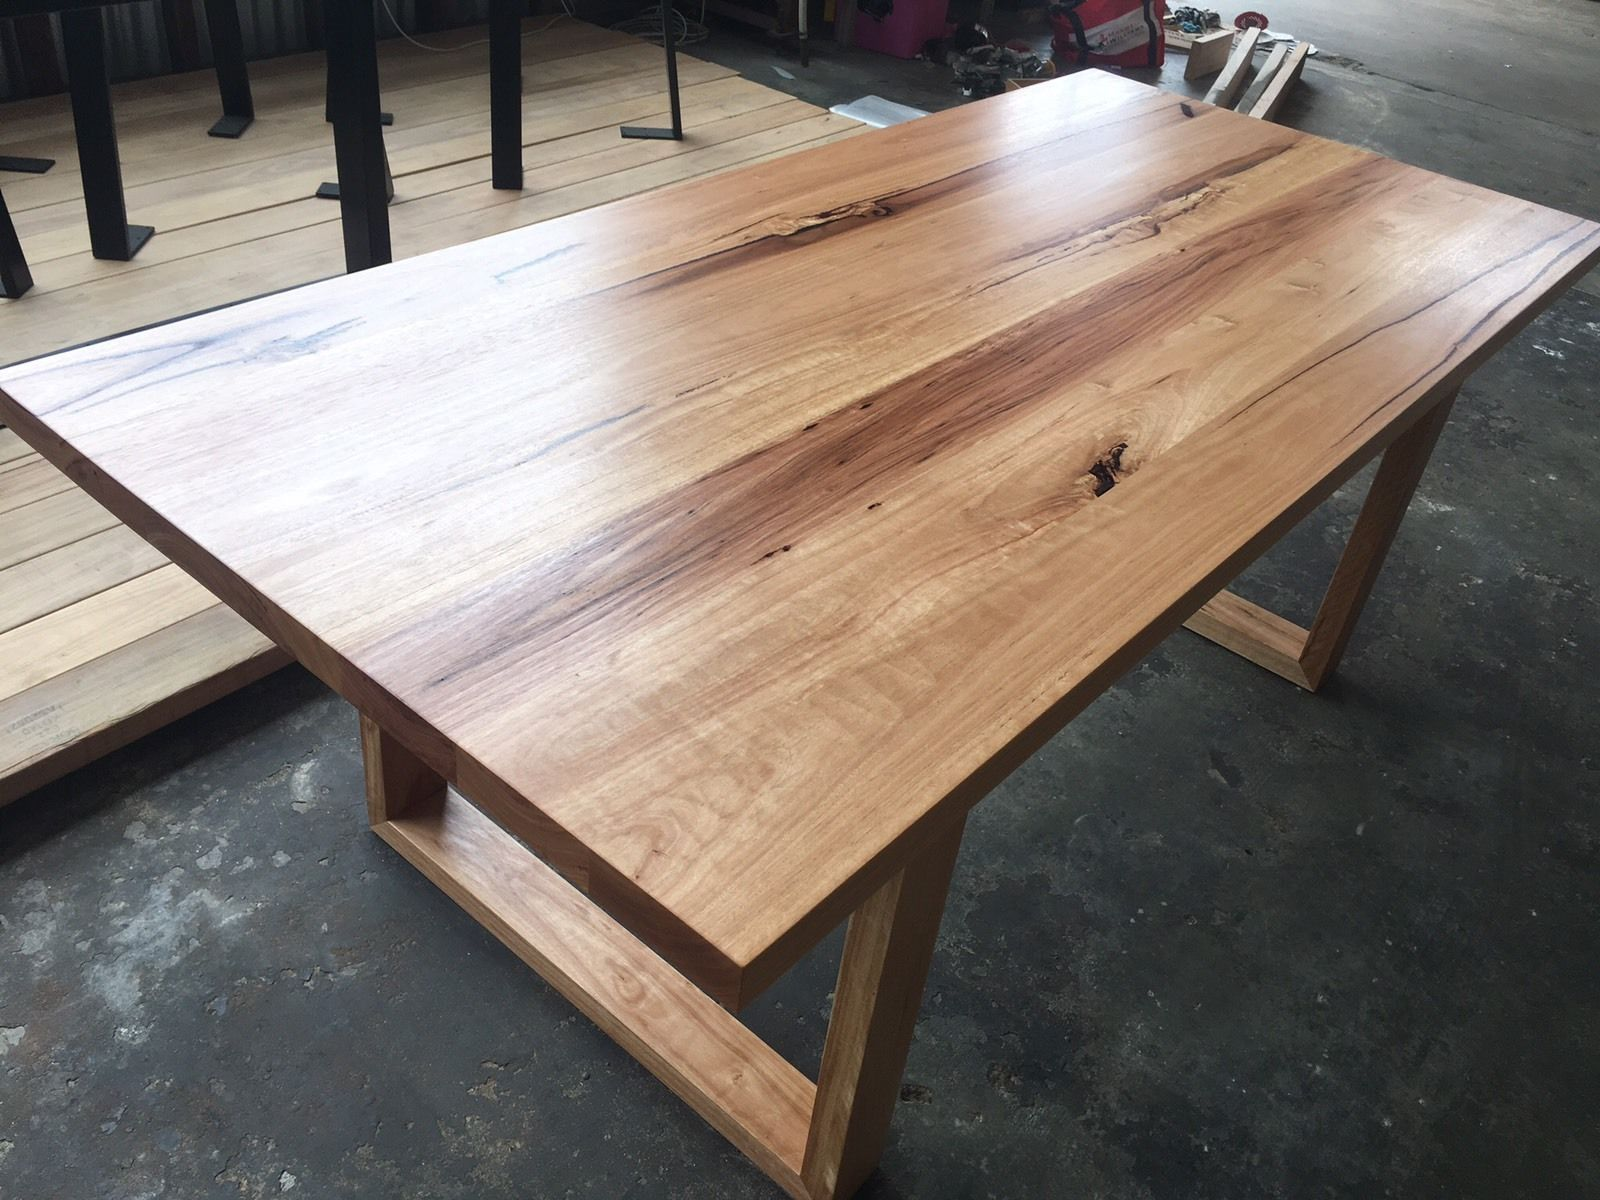 Handmade Blackbutt Hardwood Dining Table Timber Loop Leg Brisbane Timber Dining Table Handmade Dining Table Dining Table